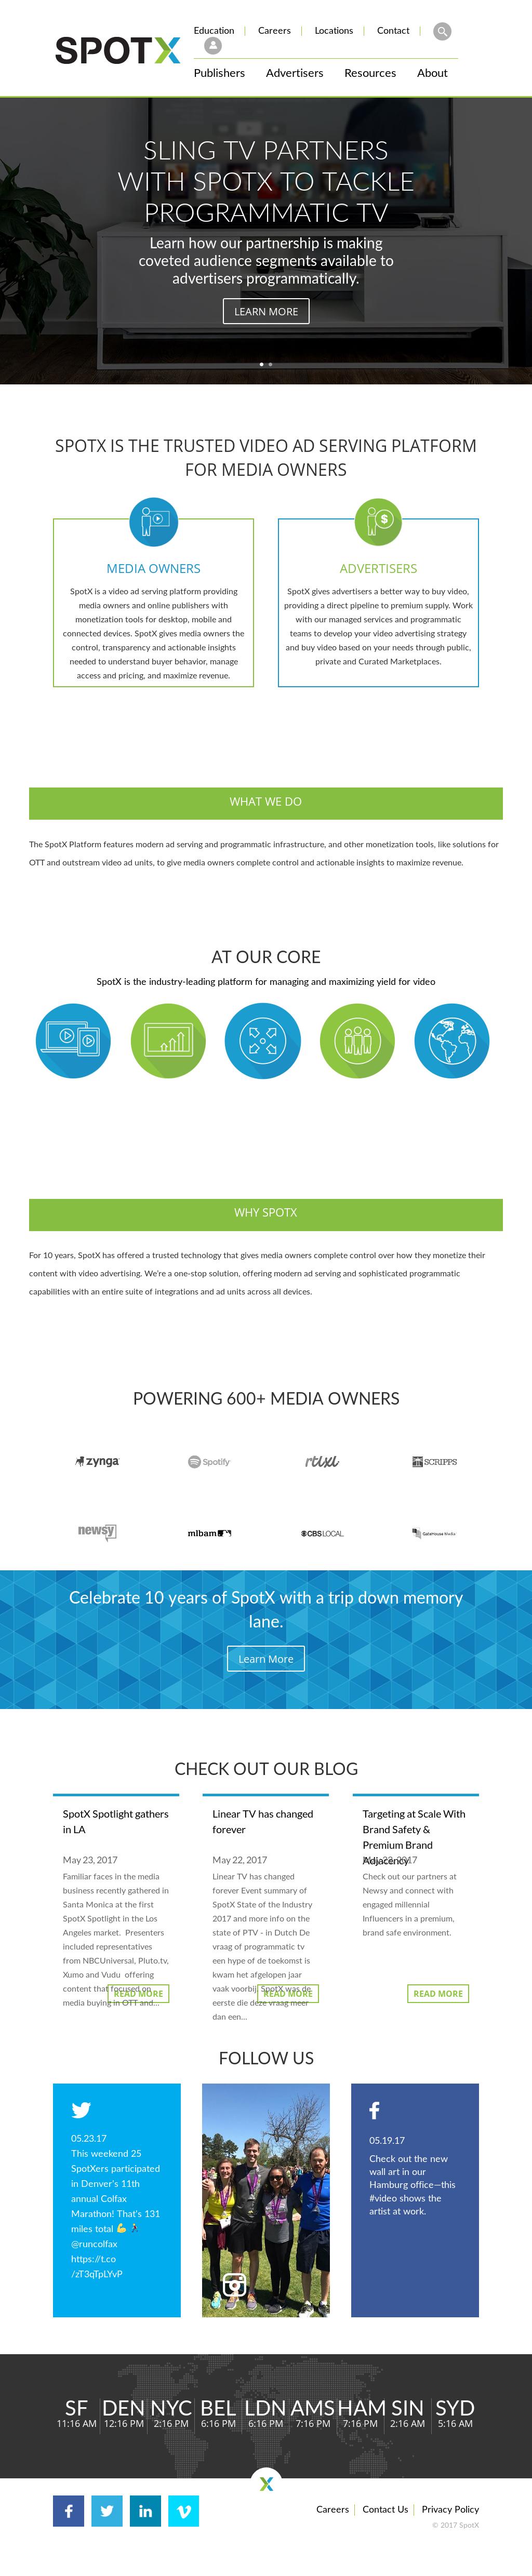 SpotX Competitors, Revenue and Employees - Owler Company Profile